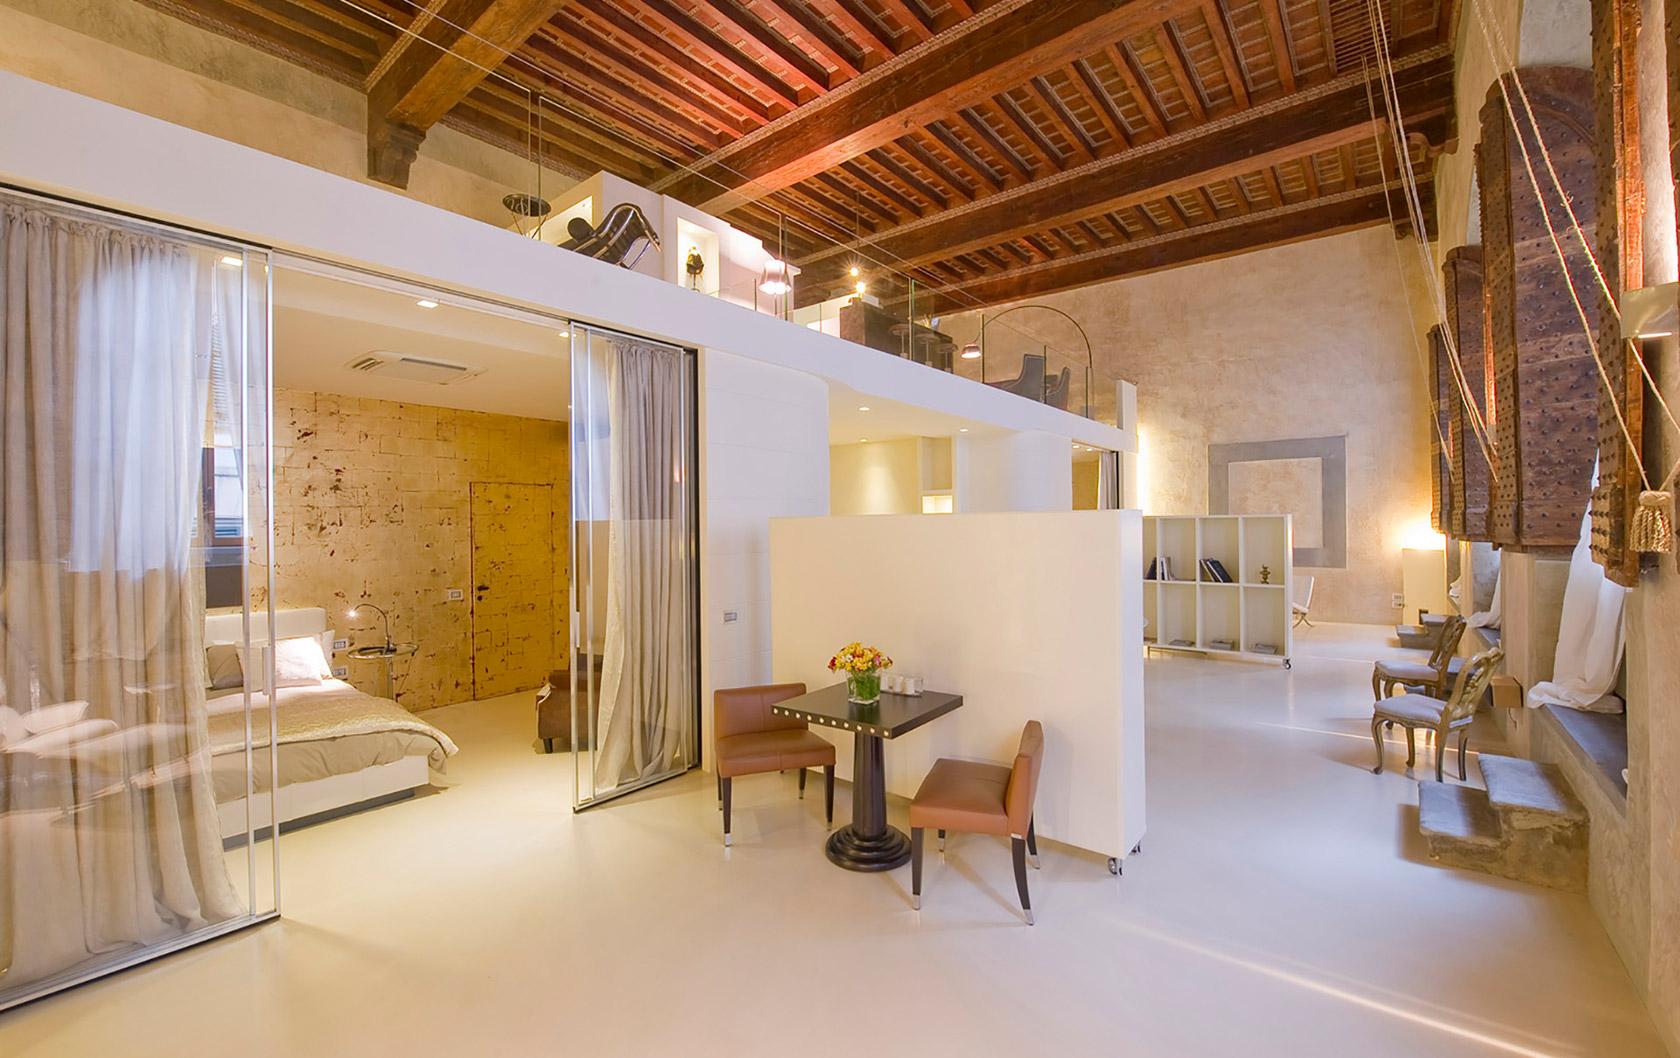 Luxury Meets Opera History: Fascinating La Camerata Fiorentina Apartment